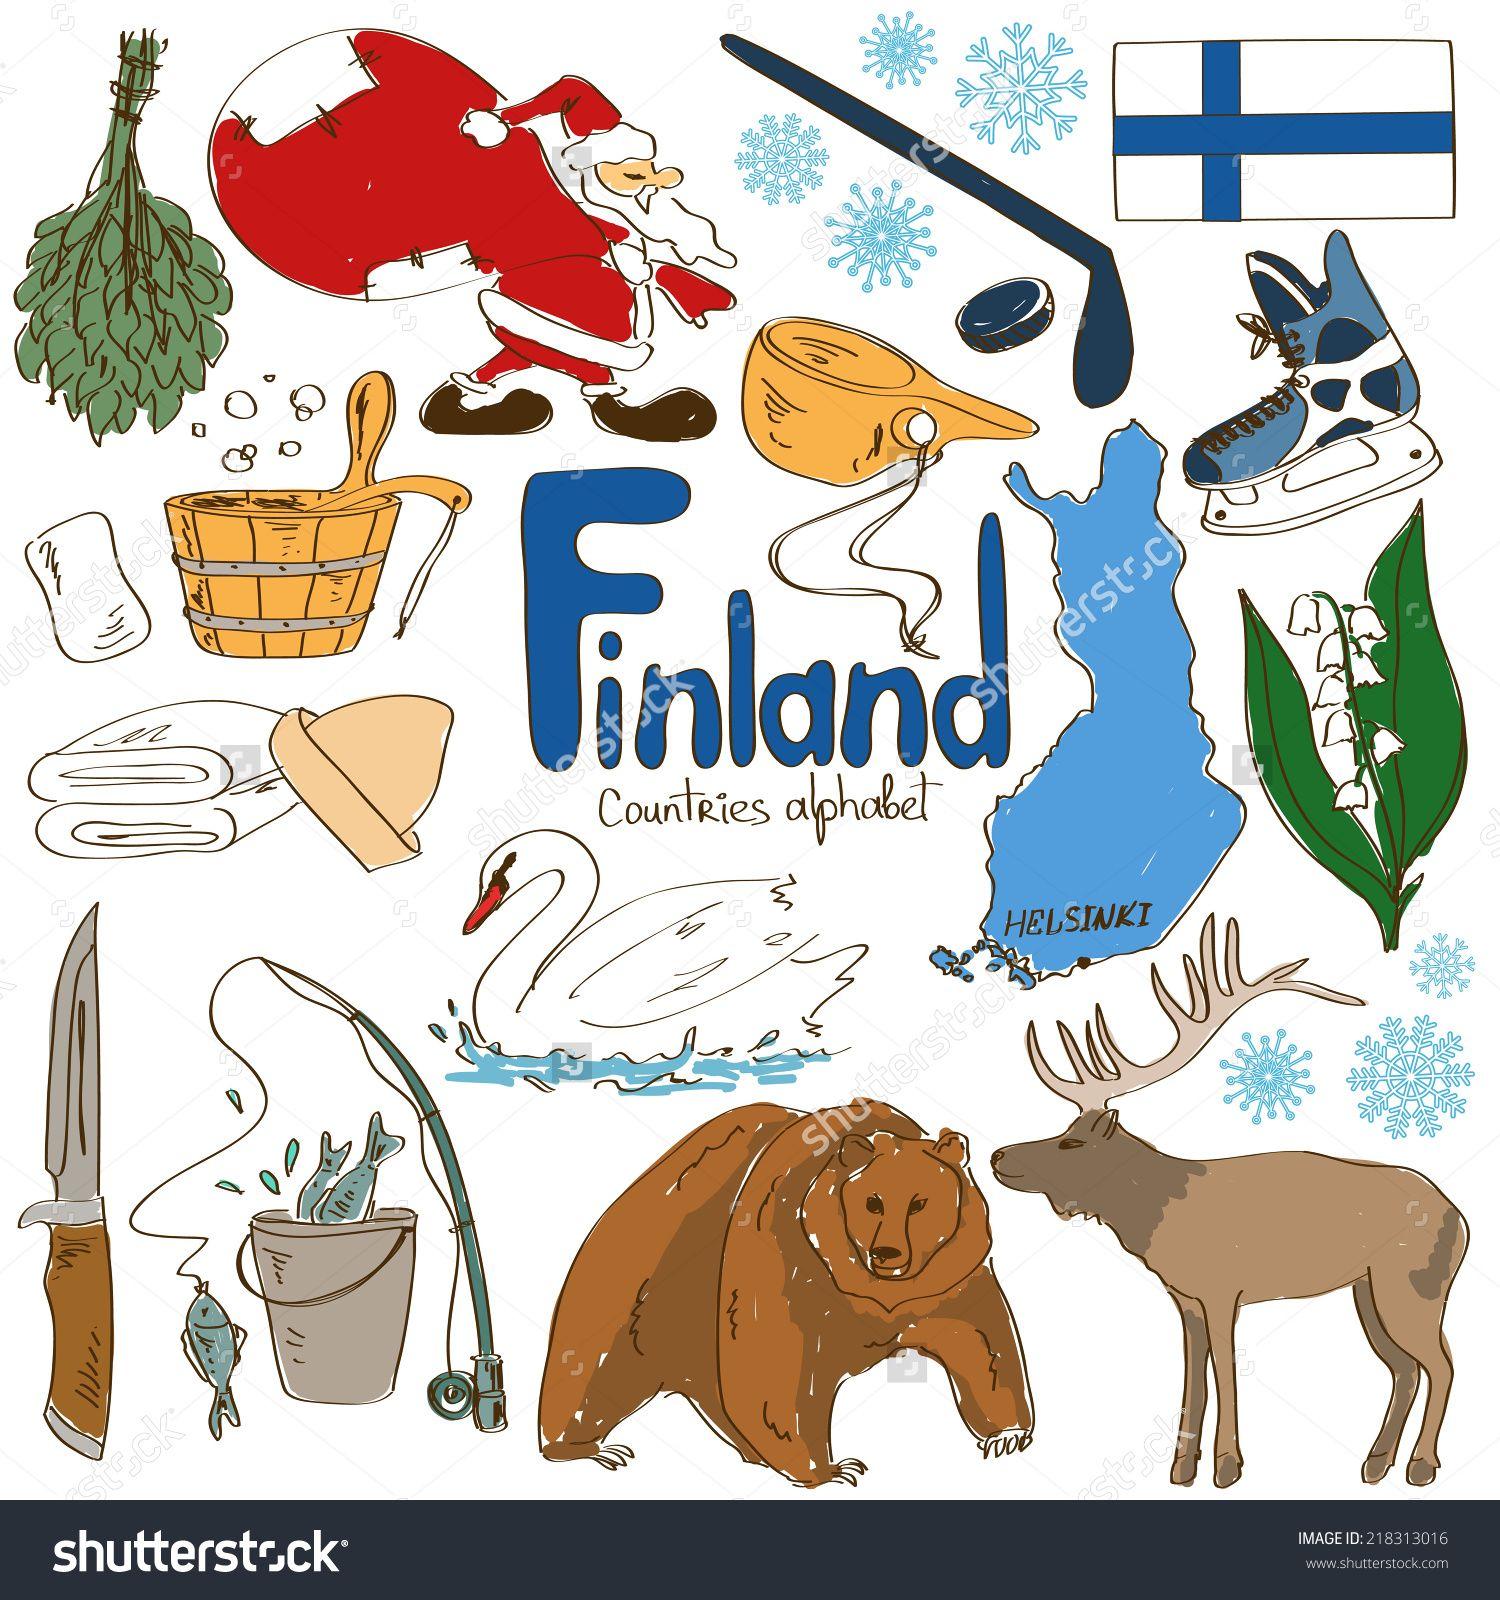 Pin By Finland 100 Toronto On Finland 100 Toronto